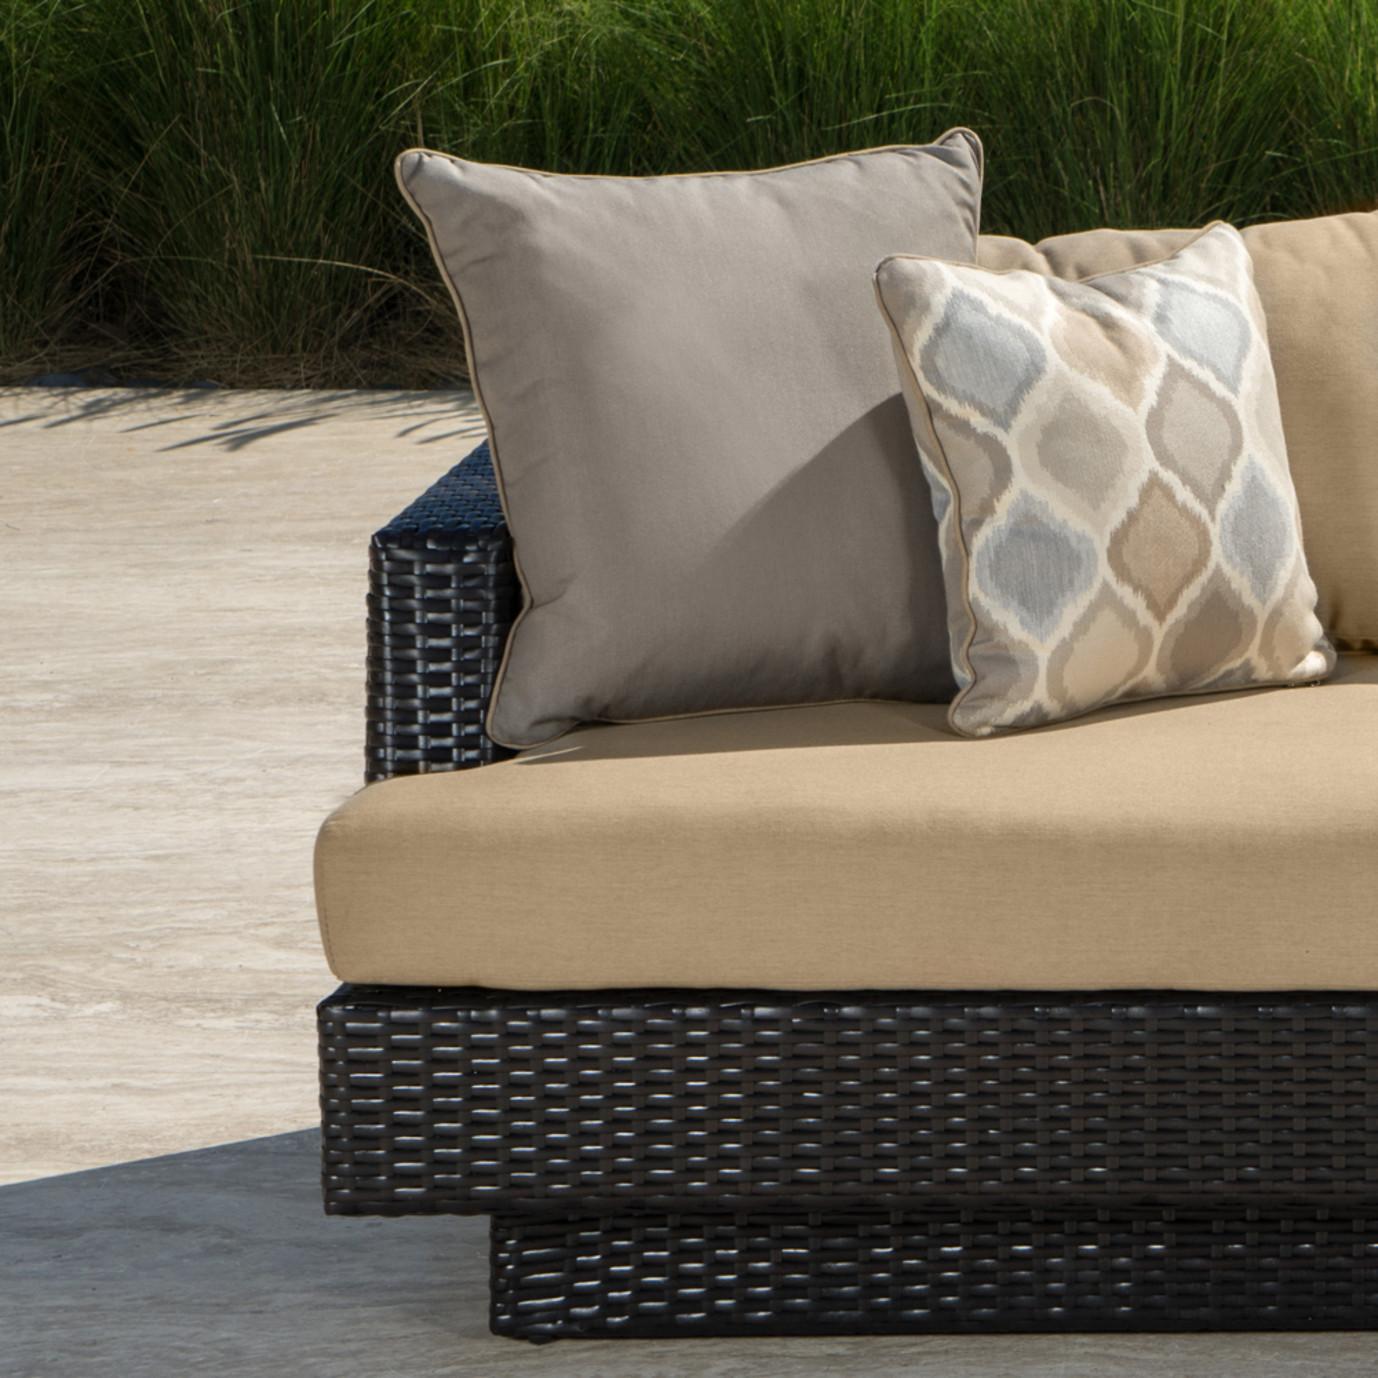 Portofino Comfort 6pc Sofa Sectional Heather Beige Rst